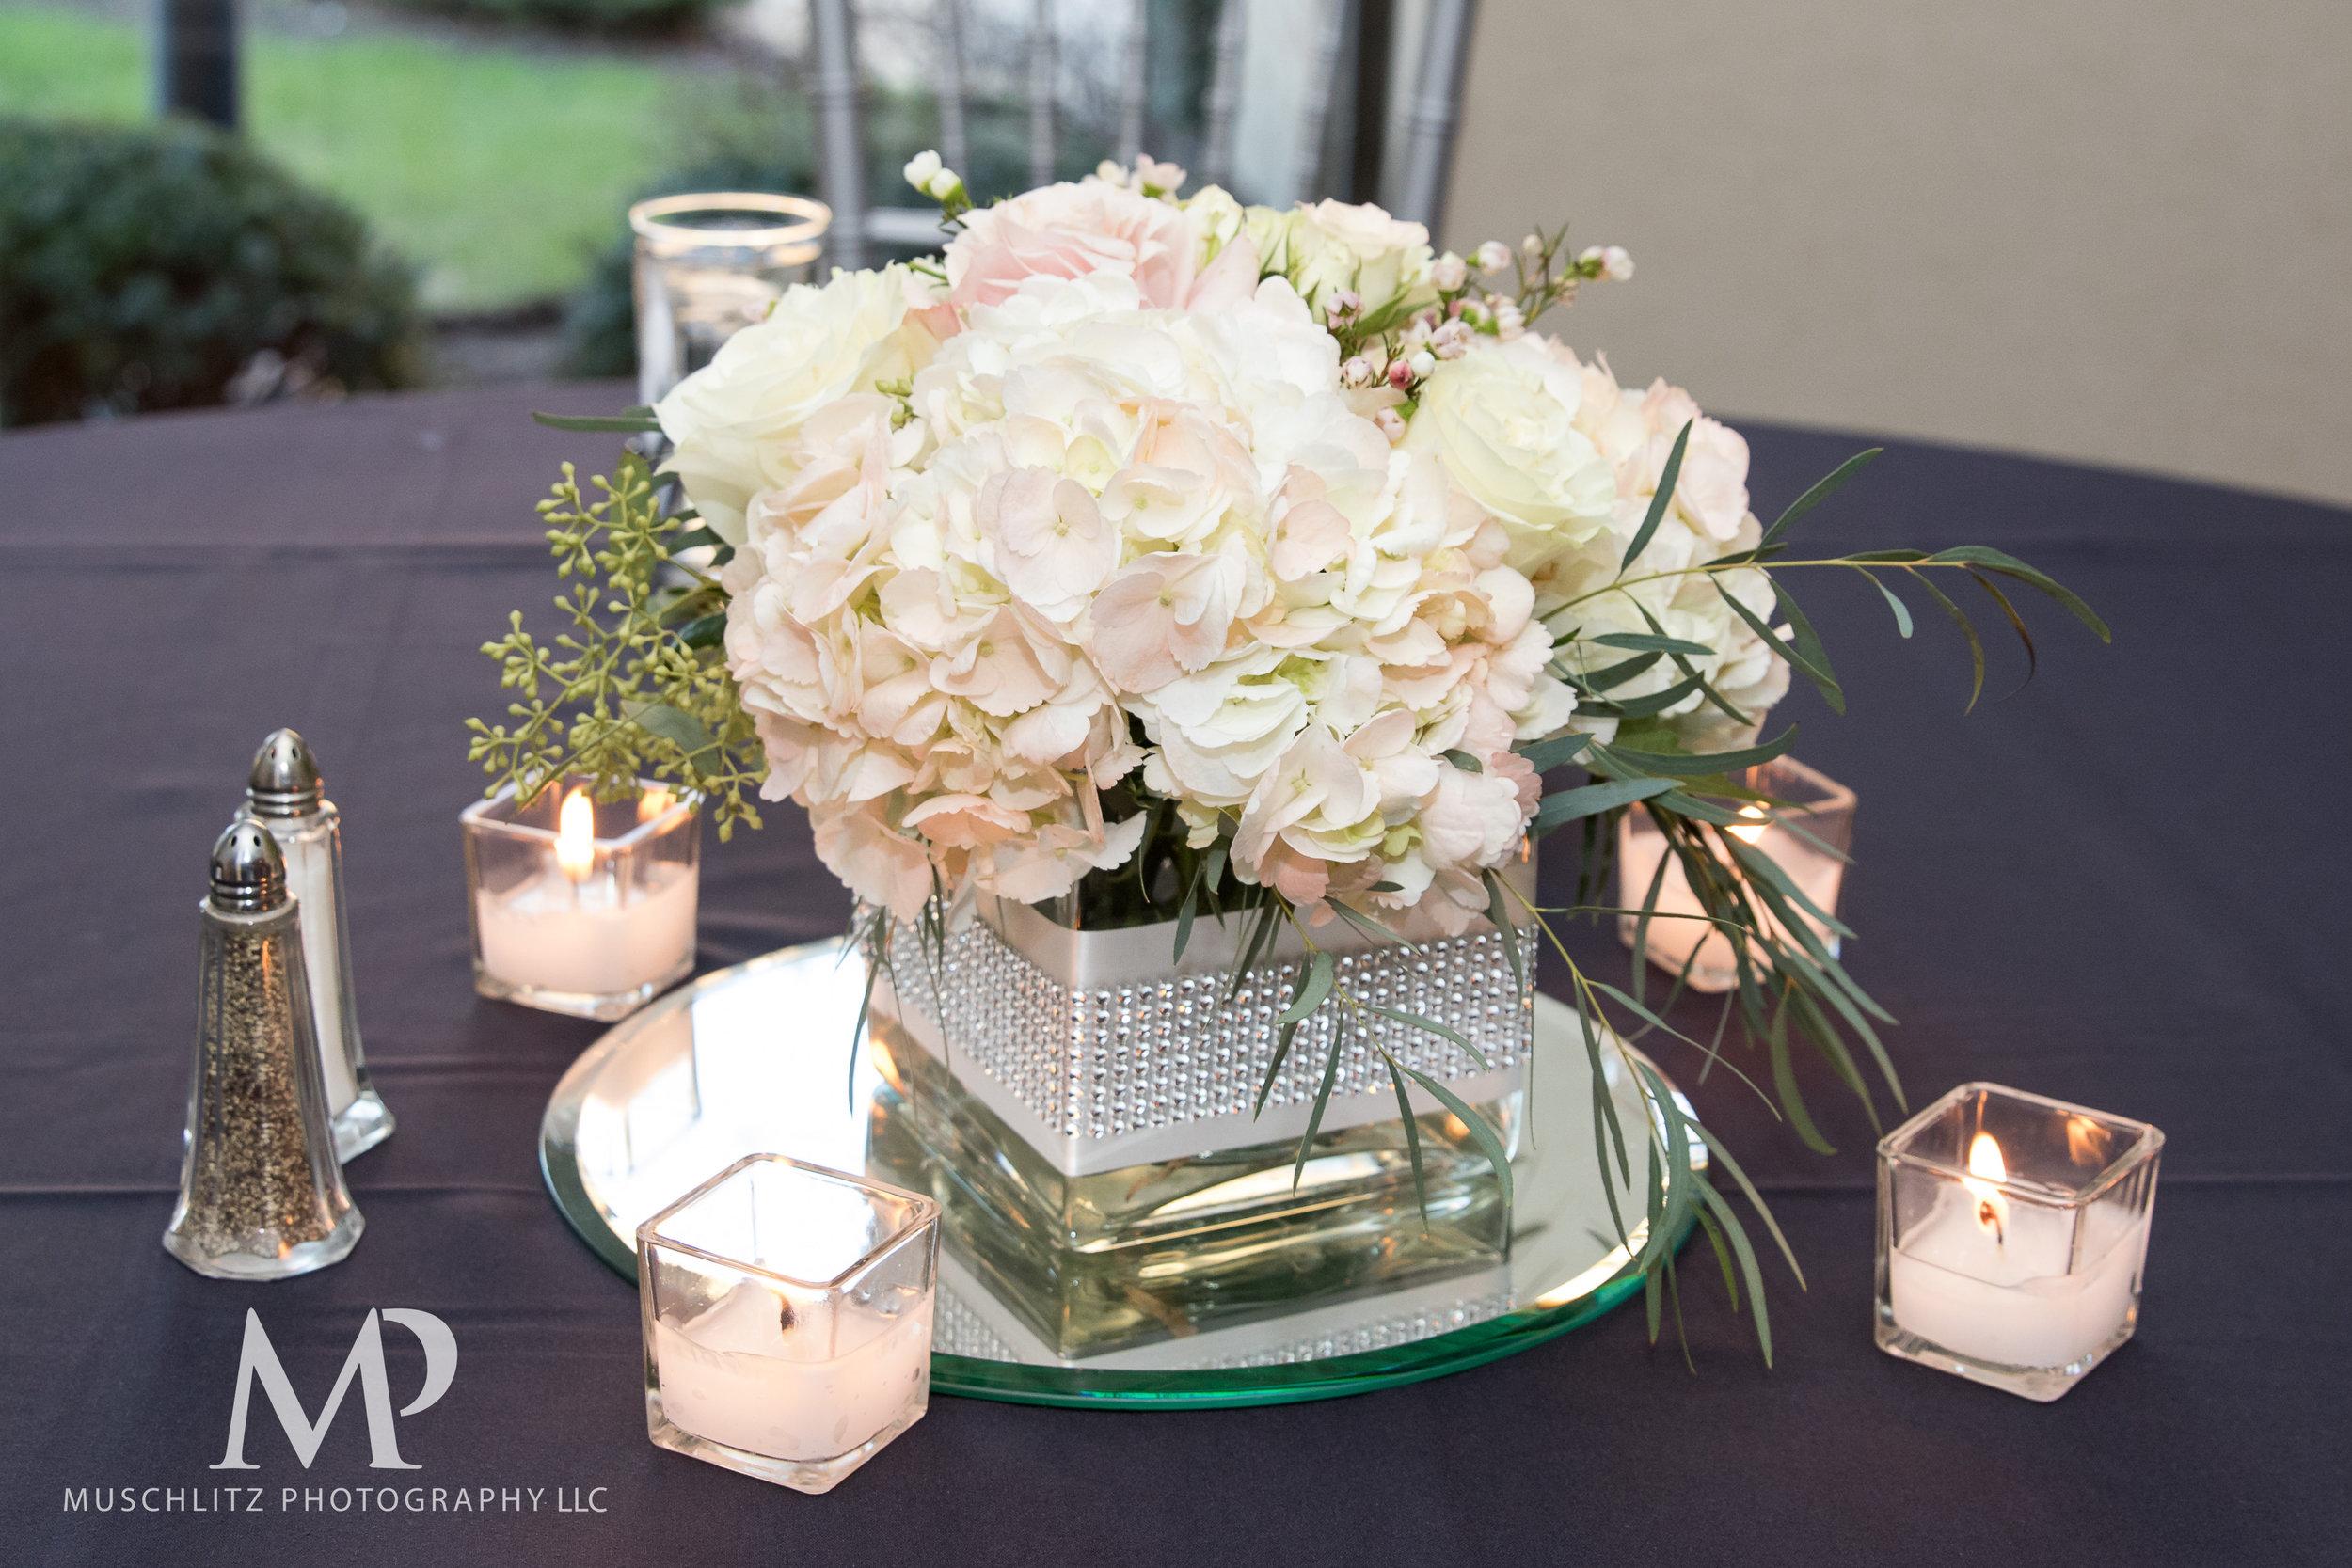 annunciation-banquet-conference-center-downtown-columbus-wedding-reception-downtown-columbus-ohio-muschlitz-photography-005.JPG